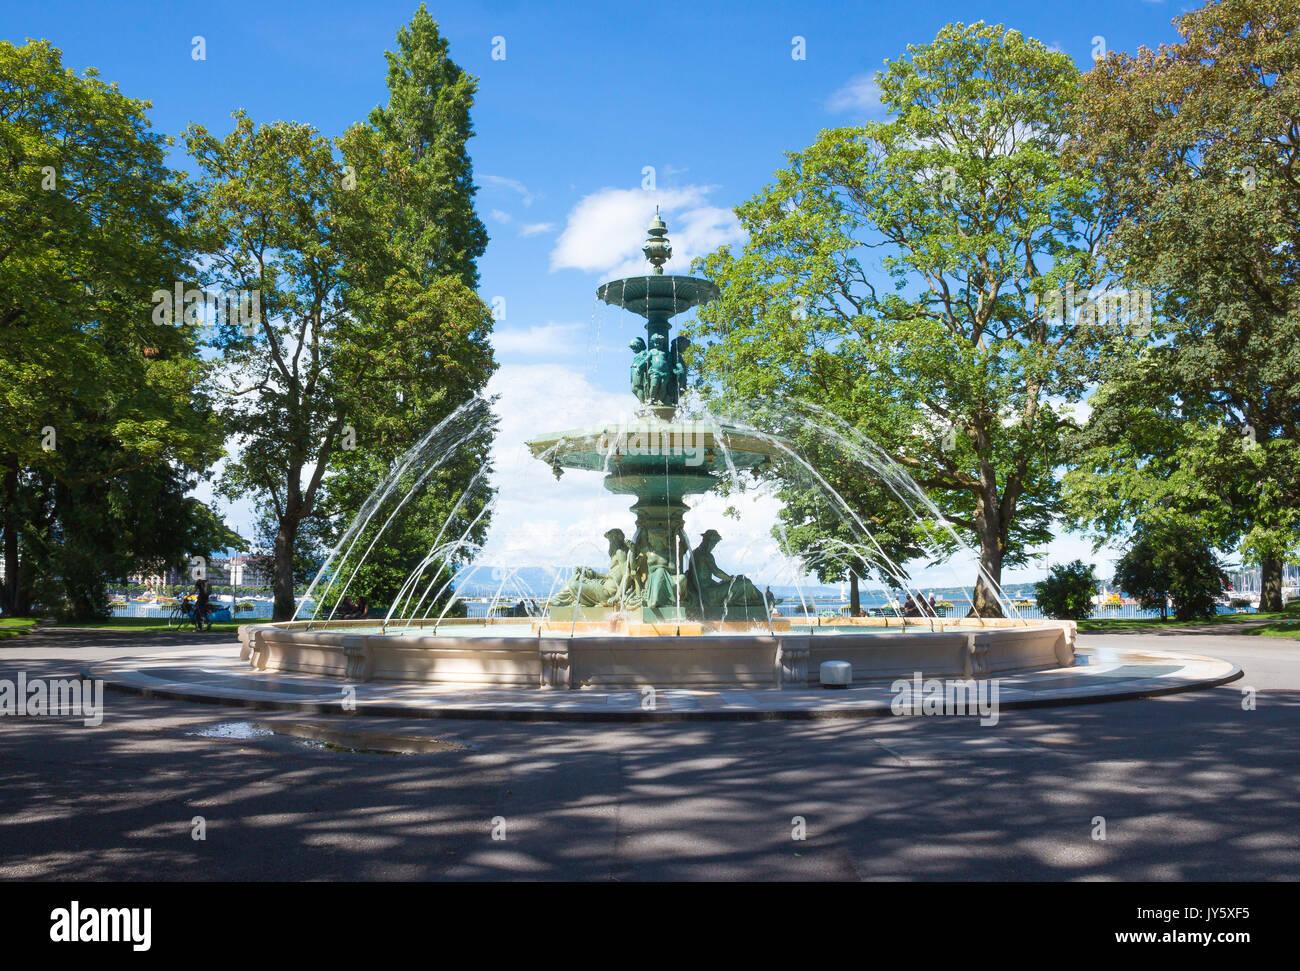 Geneva fountain stockfotos geneva fountain bilder alamy for Jardin anglais geneve suisse